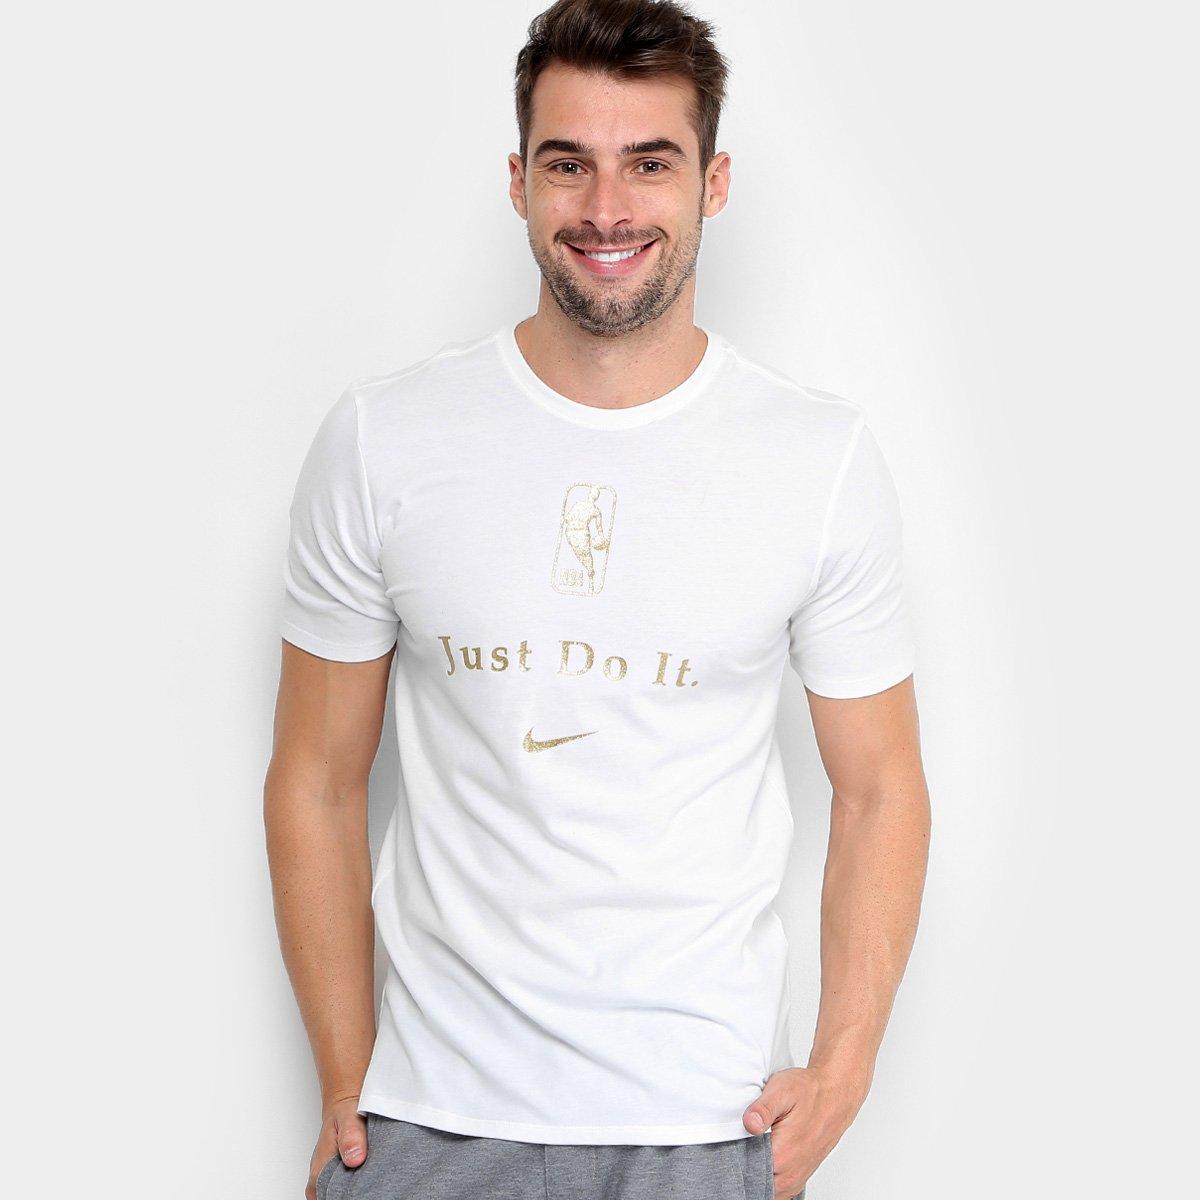 Camiseta Nike NBA Just do It Masculina - Branco e dourado - Compre ... 502e254f7e78c